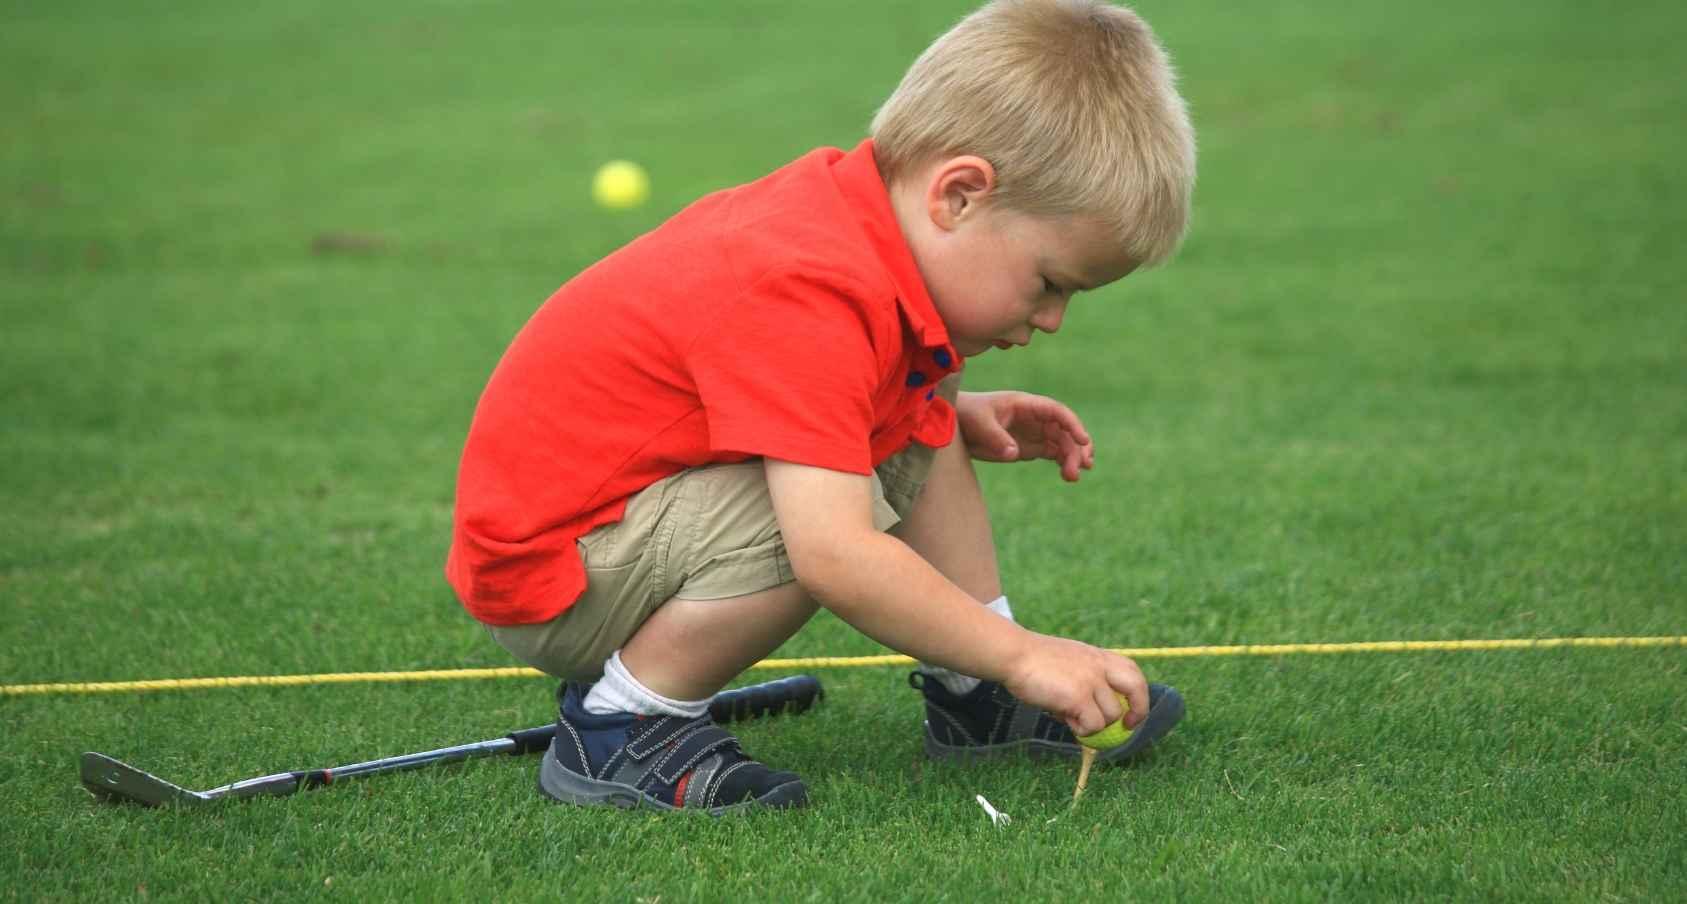 'Drive Out Child Abuse' Golf Scramble image